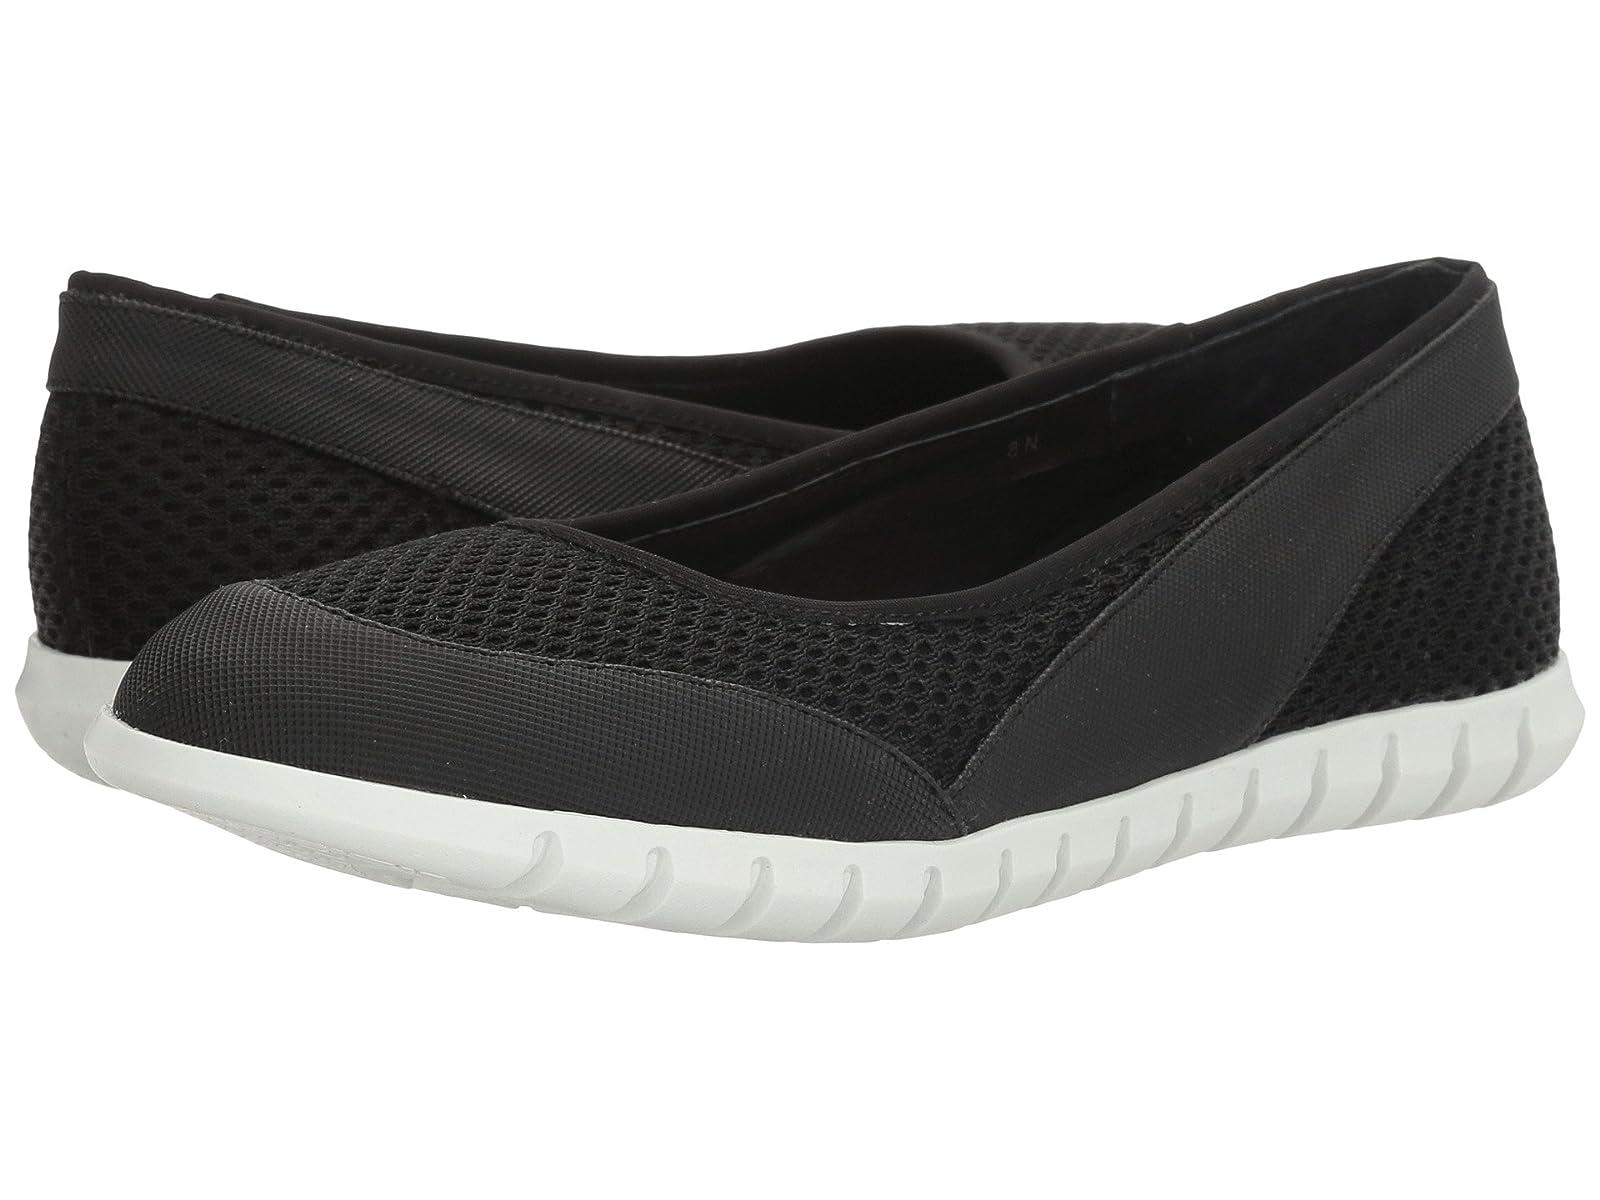 Vaneli KendaCheap and distinctive eye-catching shoes